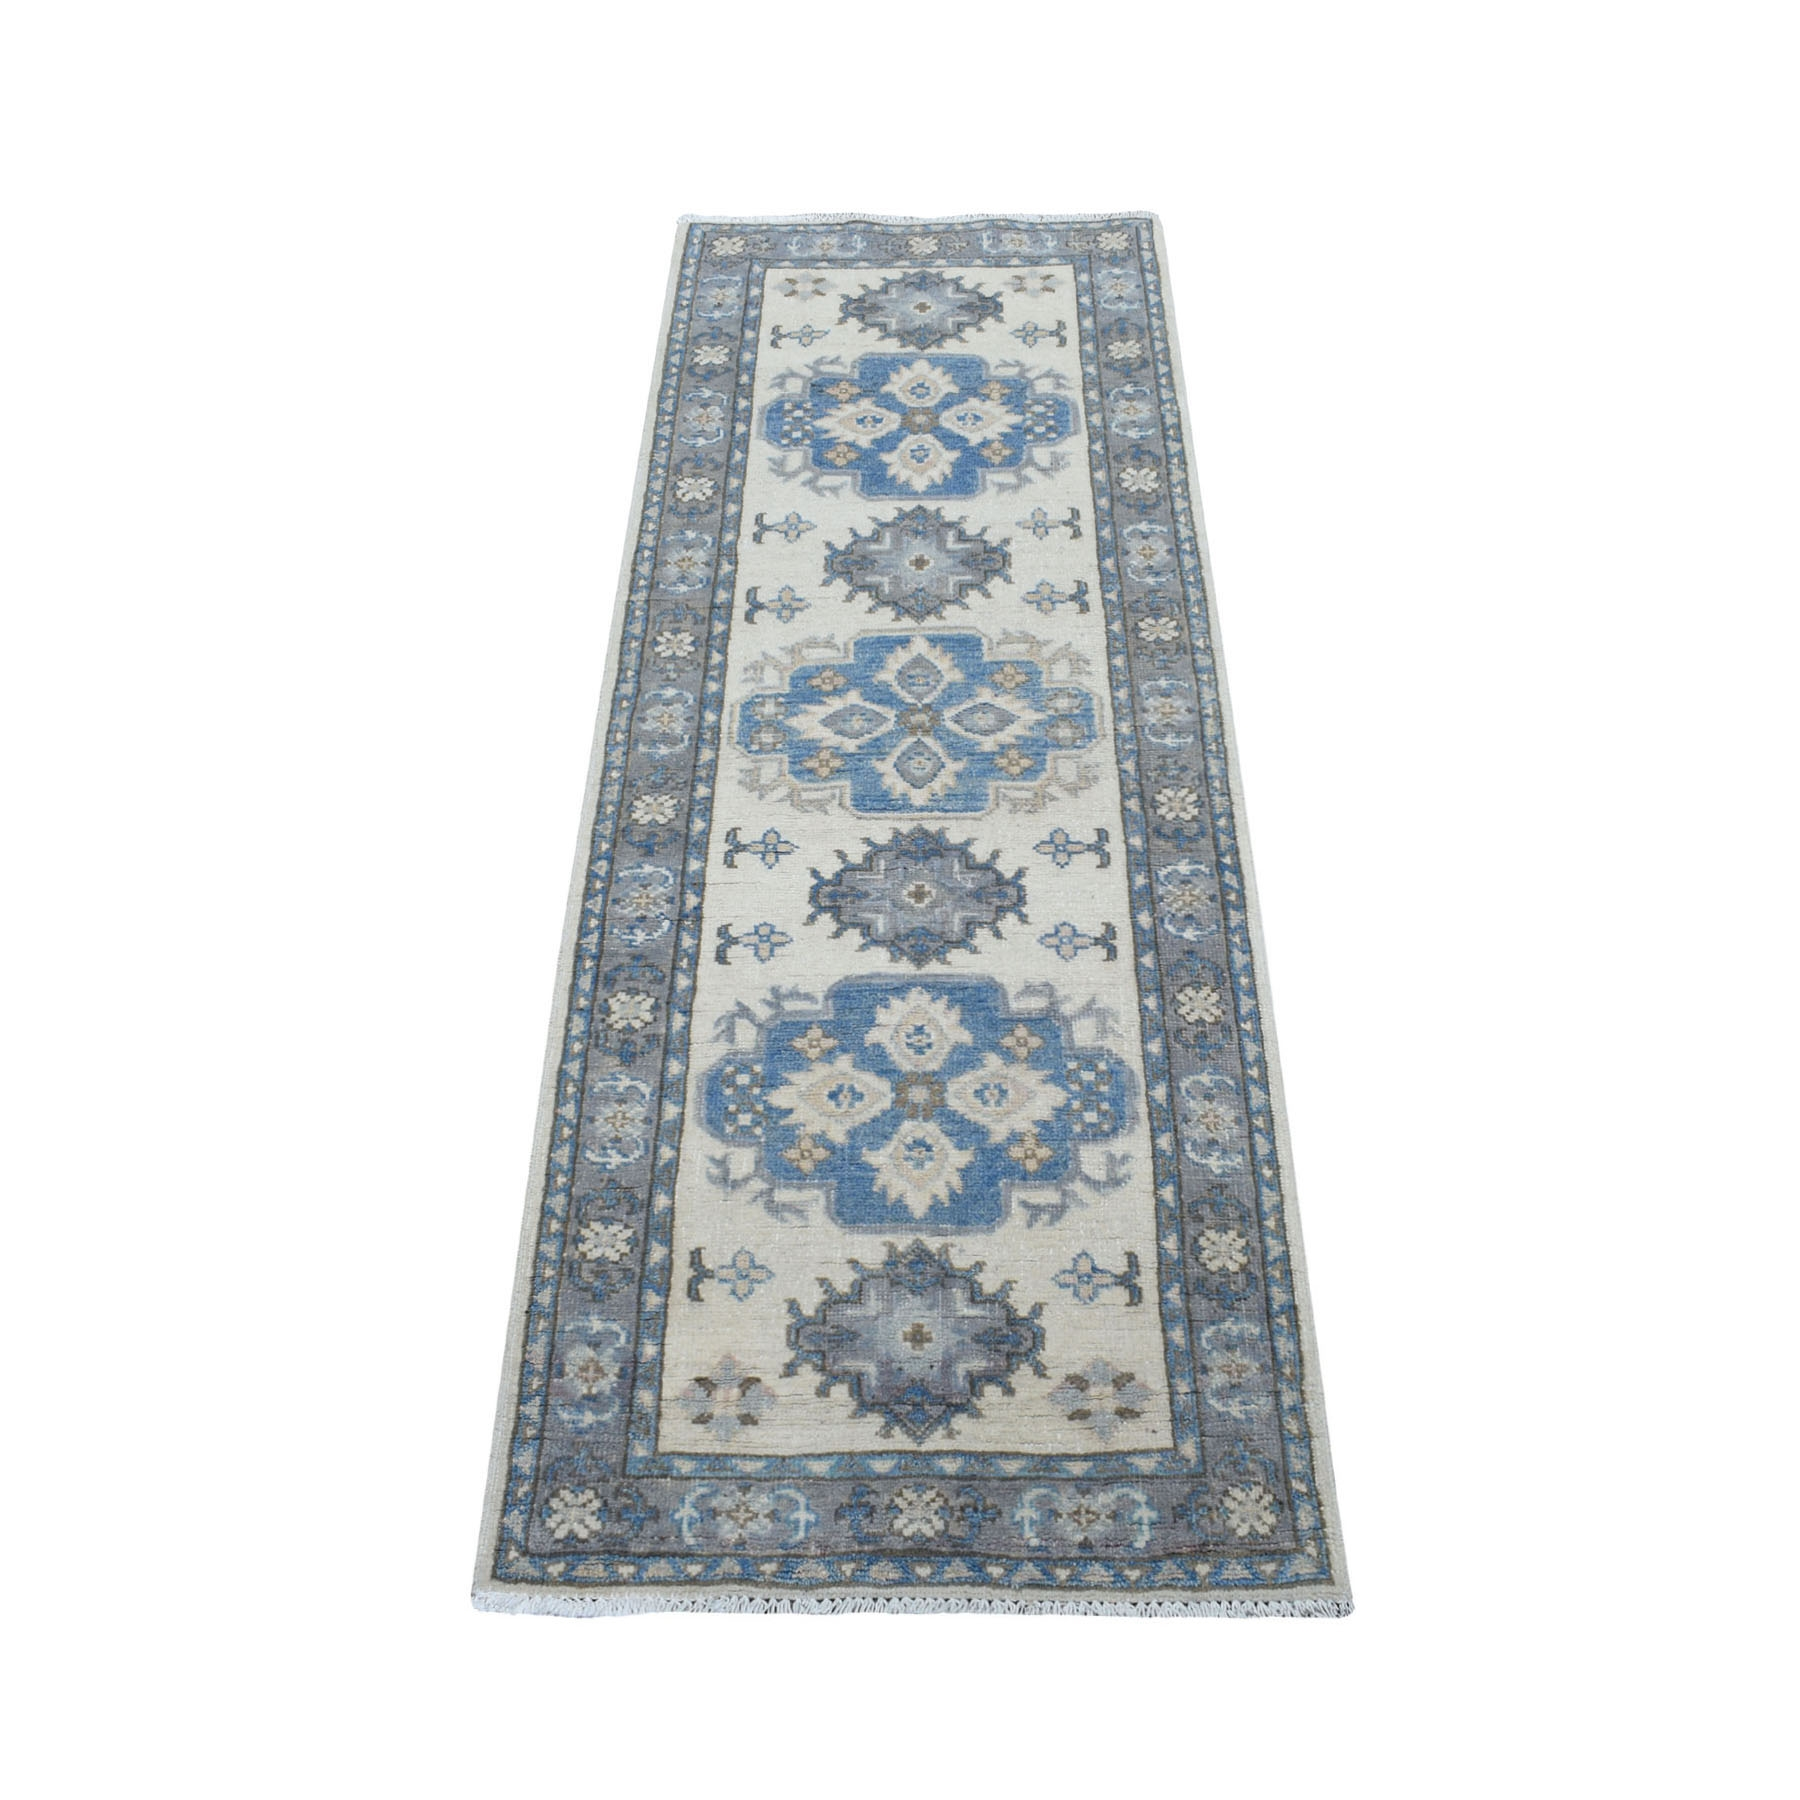 "2'1""x5'9"" Ivory Vintage Look Kazak Organic Wool Hand Knotted Runner Oriental Rug"